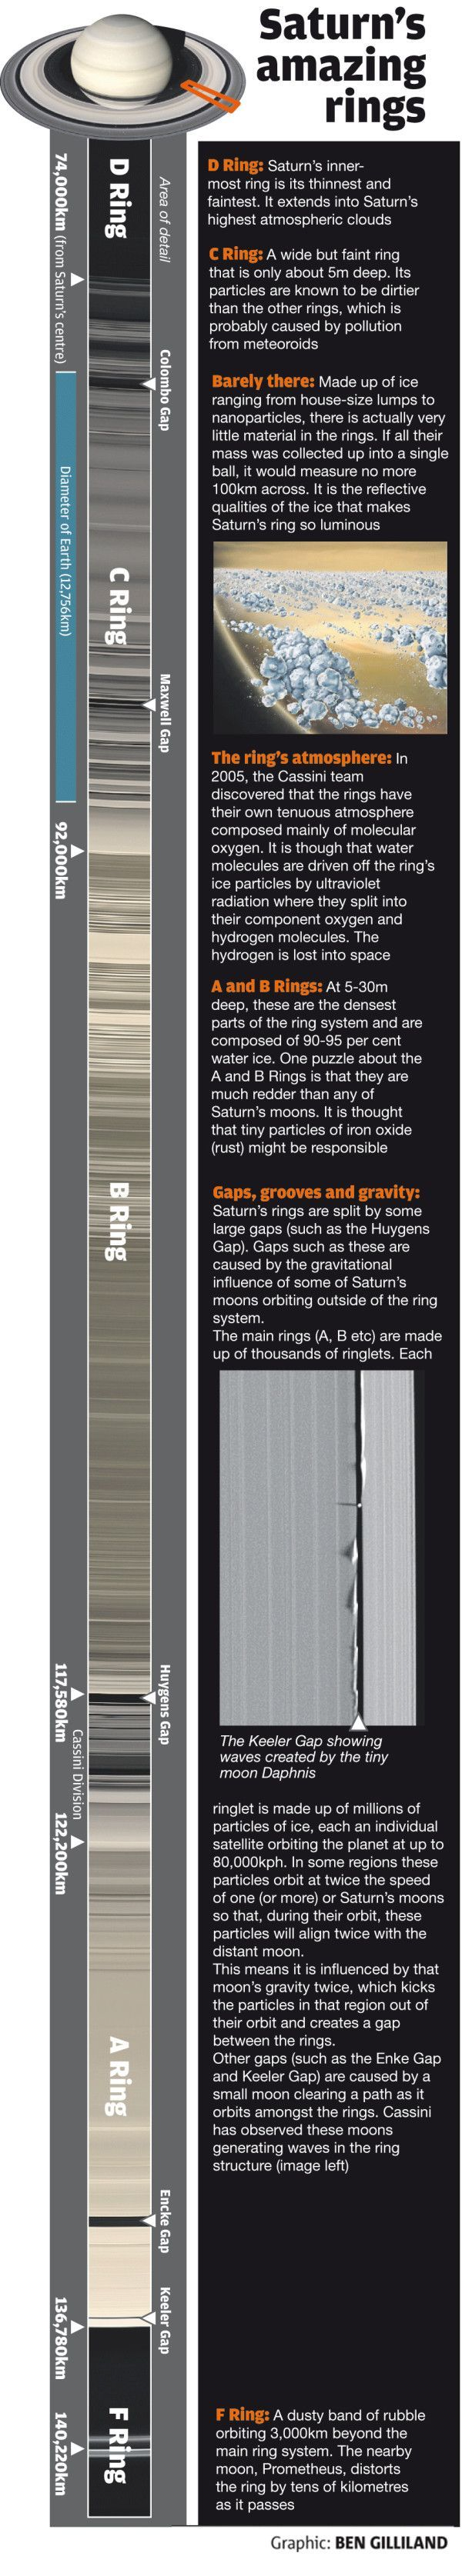 Saturne - Anneaux